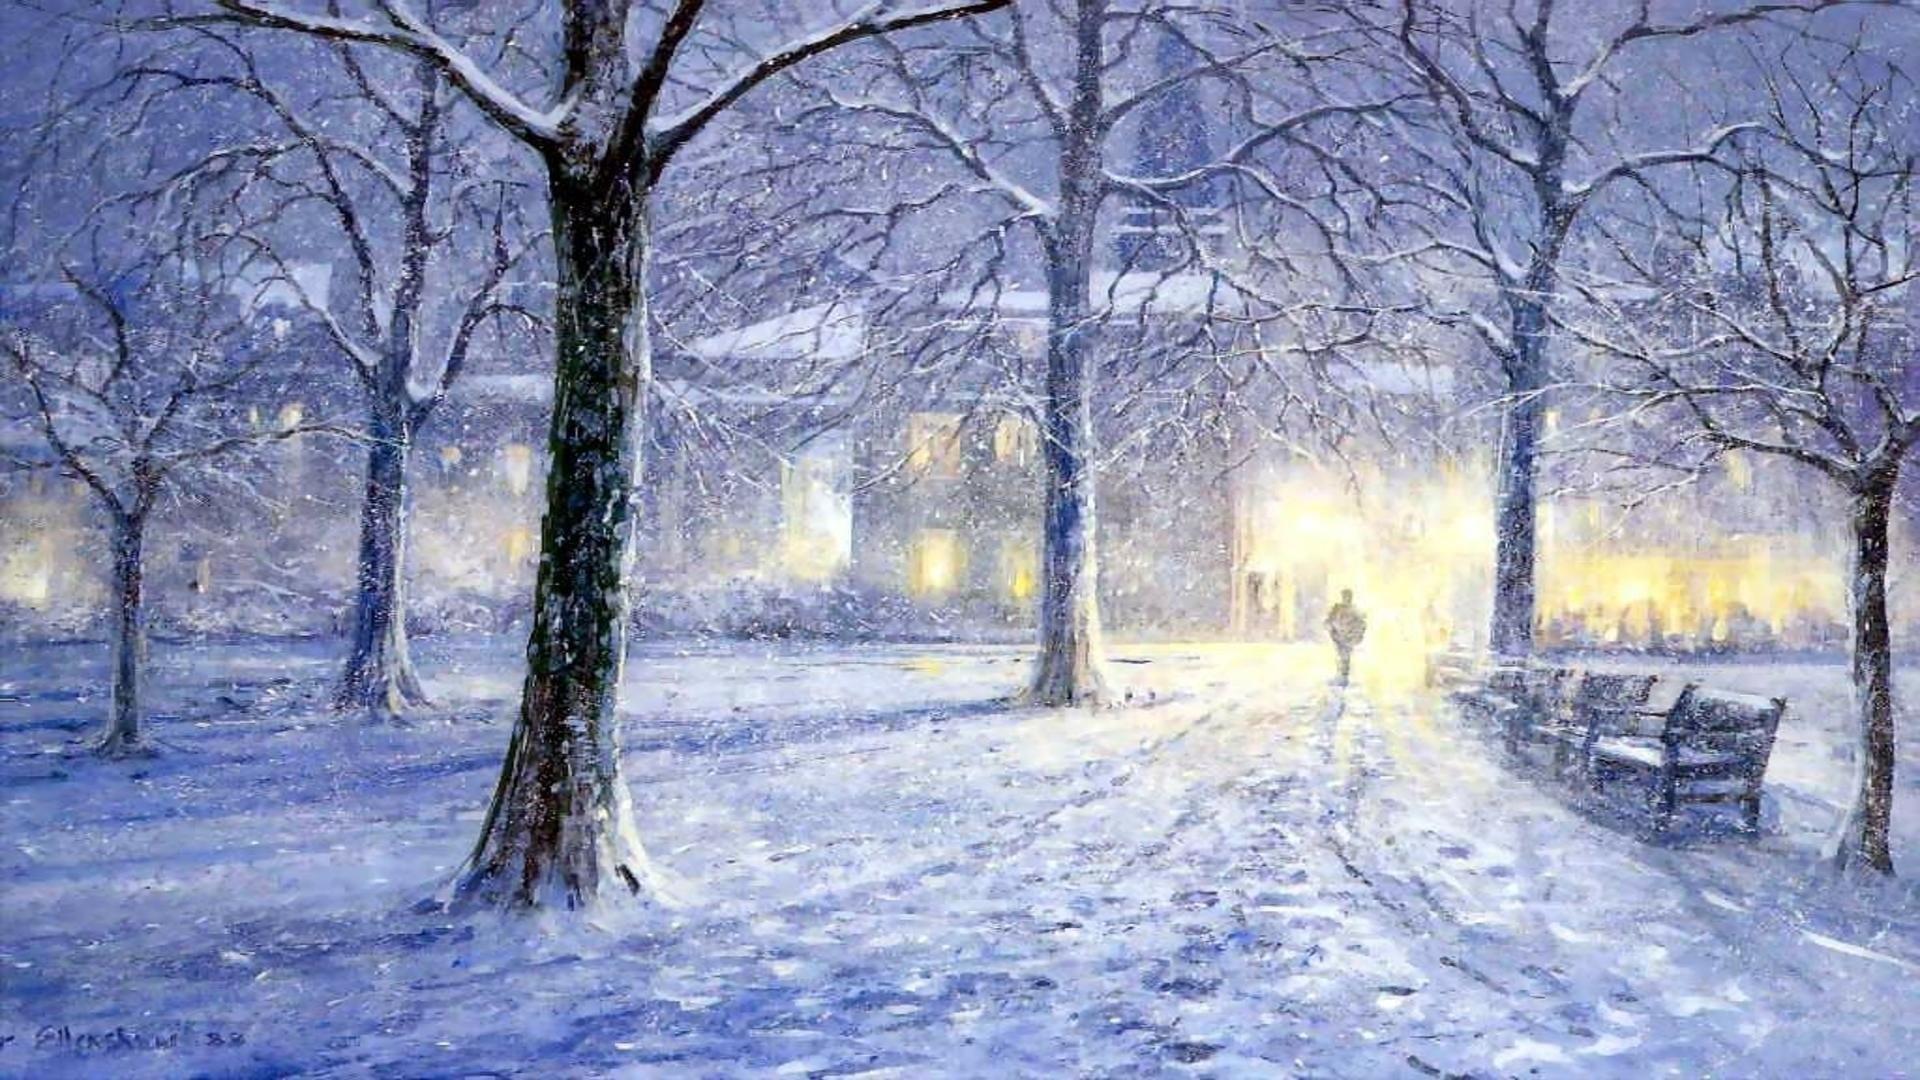 undefined Winter Backgrounds For Desktop Wallpapers)